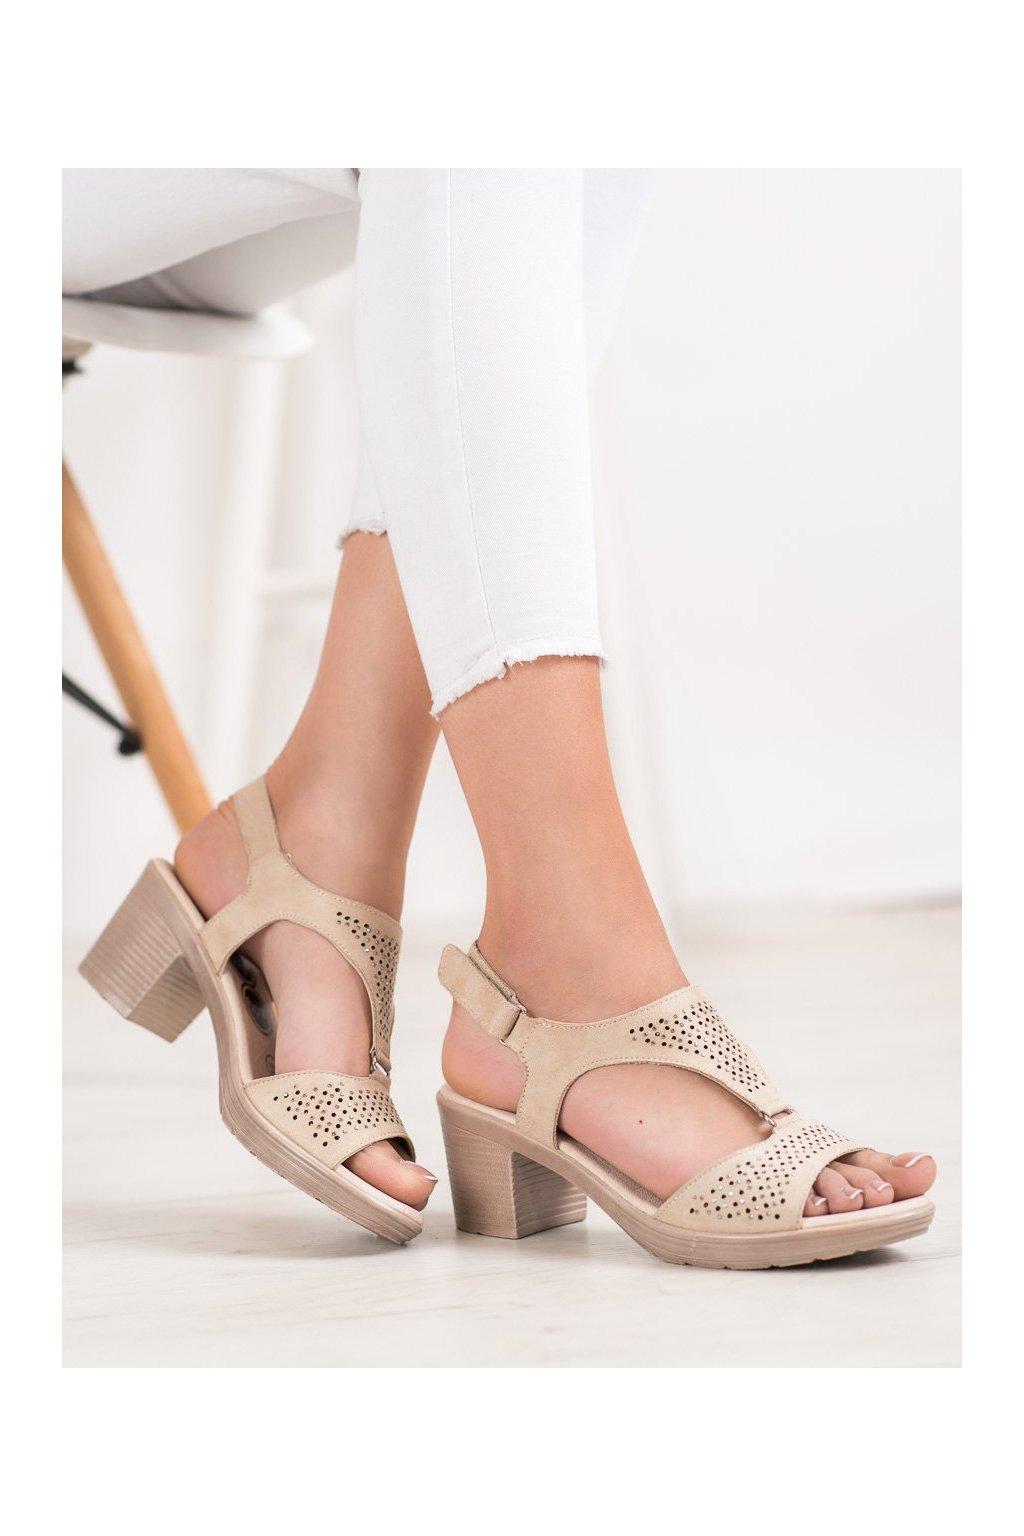 Hnedé sandále Shelovet kod B119-06-01BE